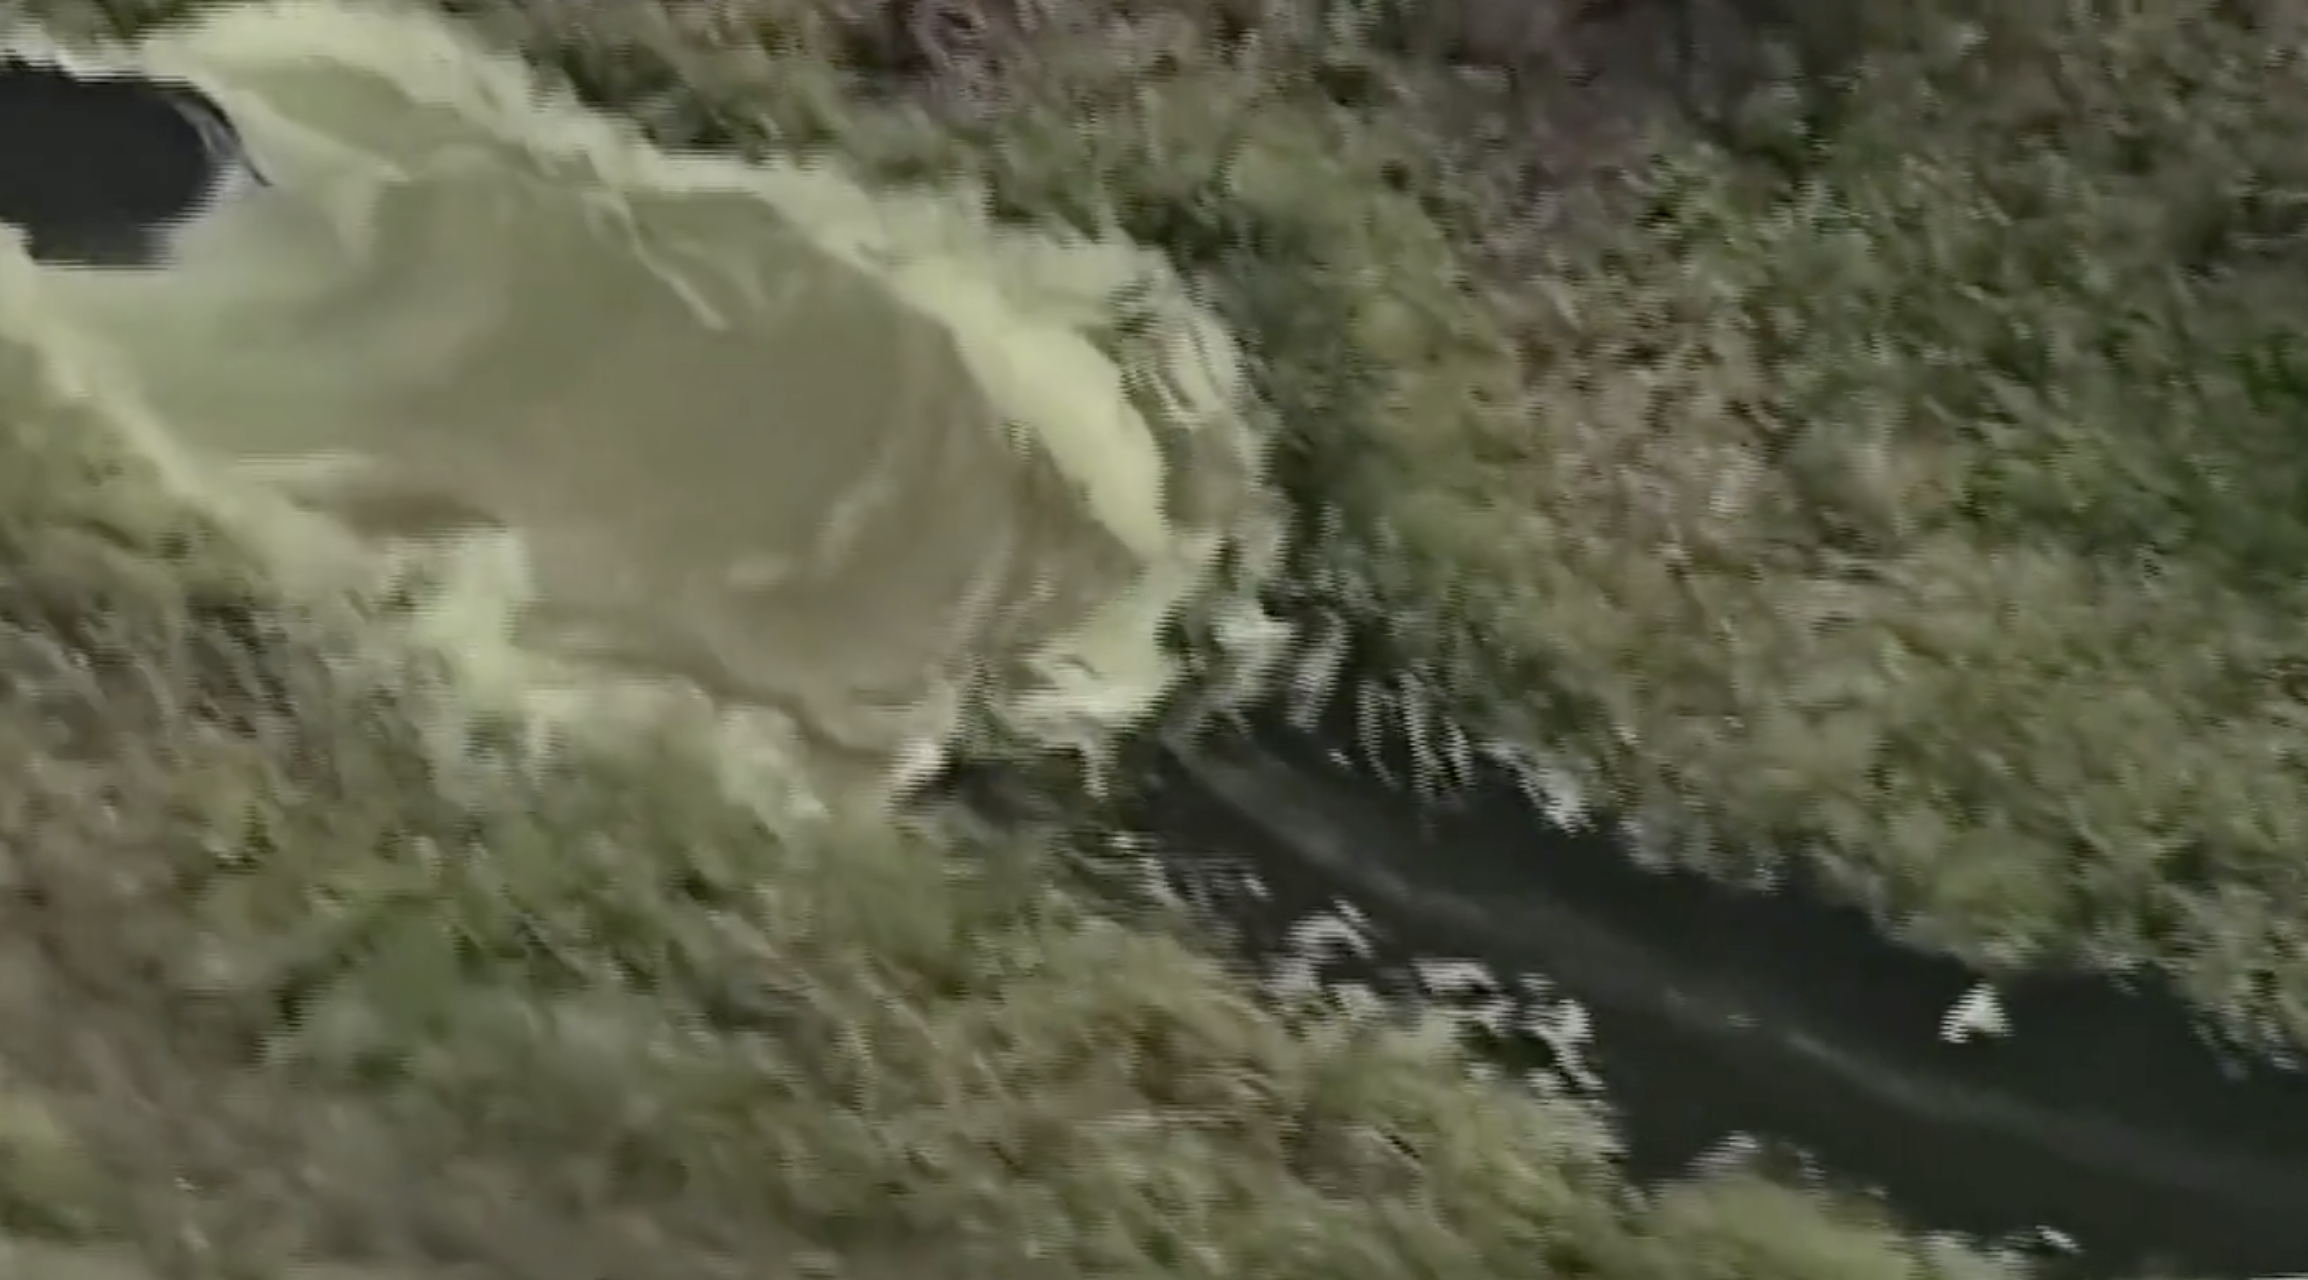 Piney Point toxic waste leak